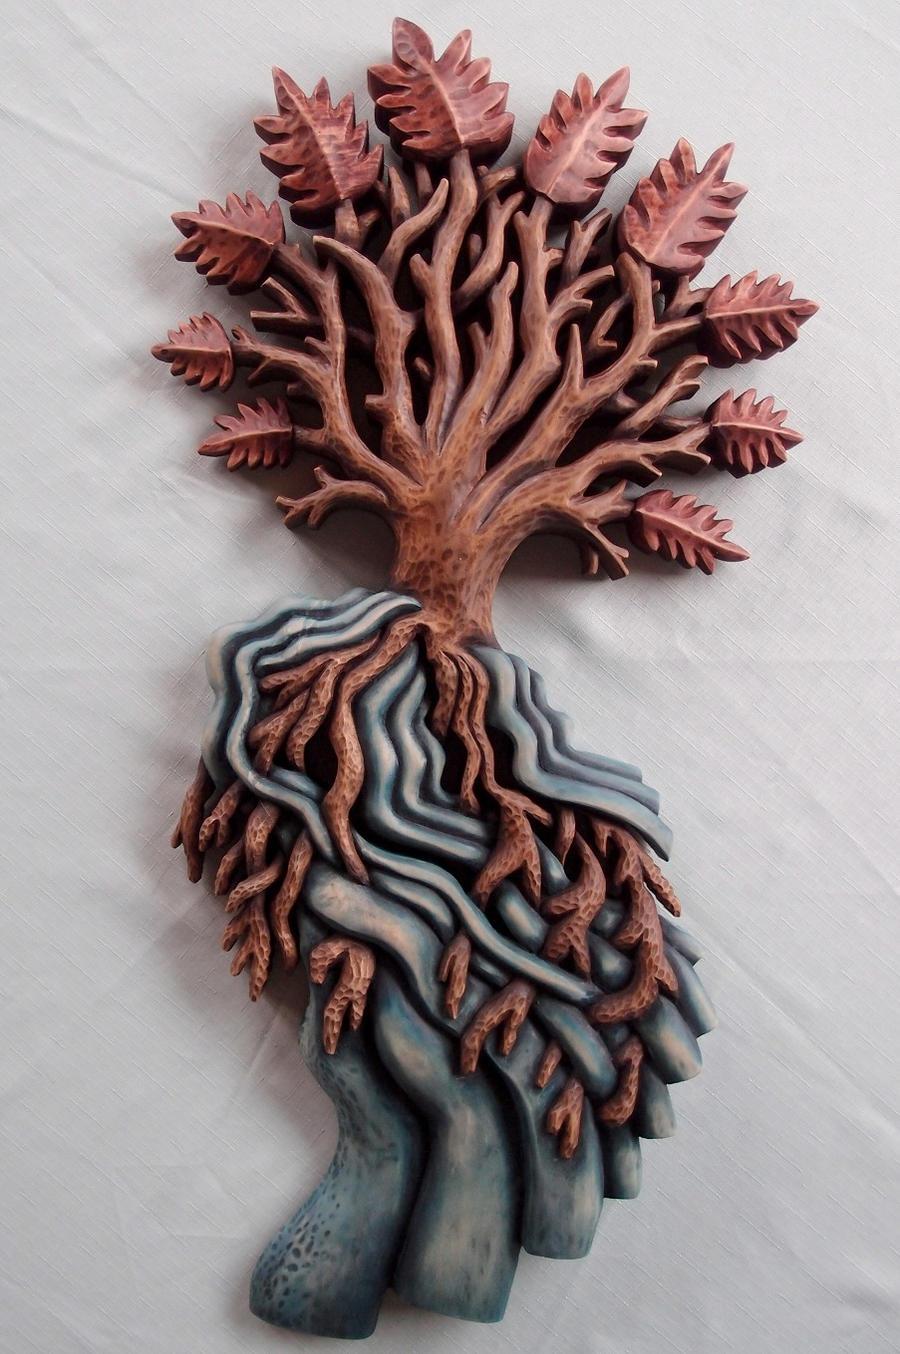 Yggdrasil by Ljotunnr